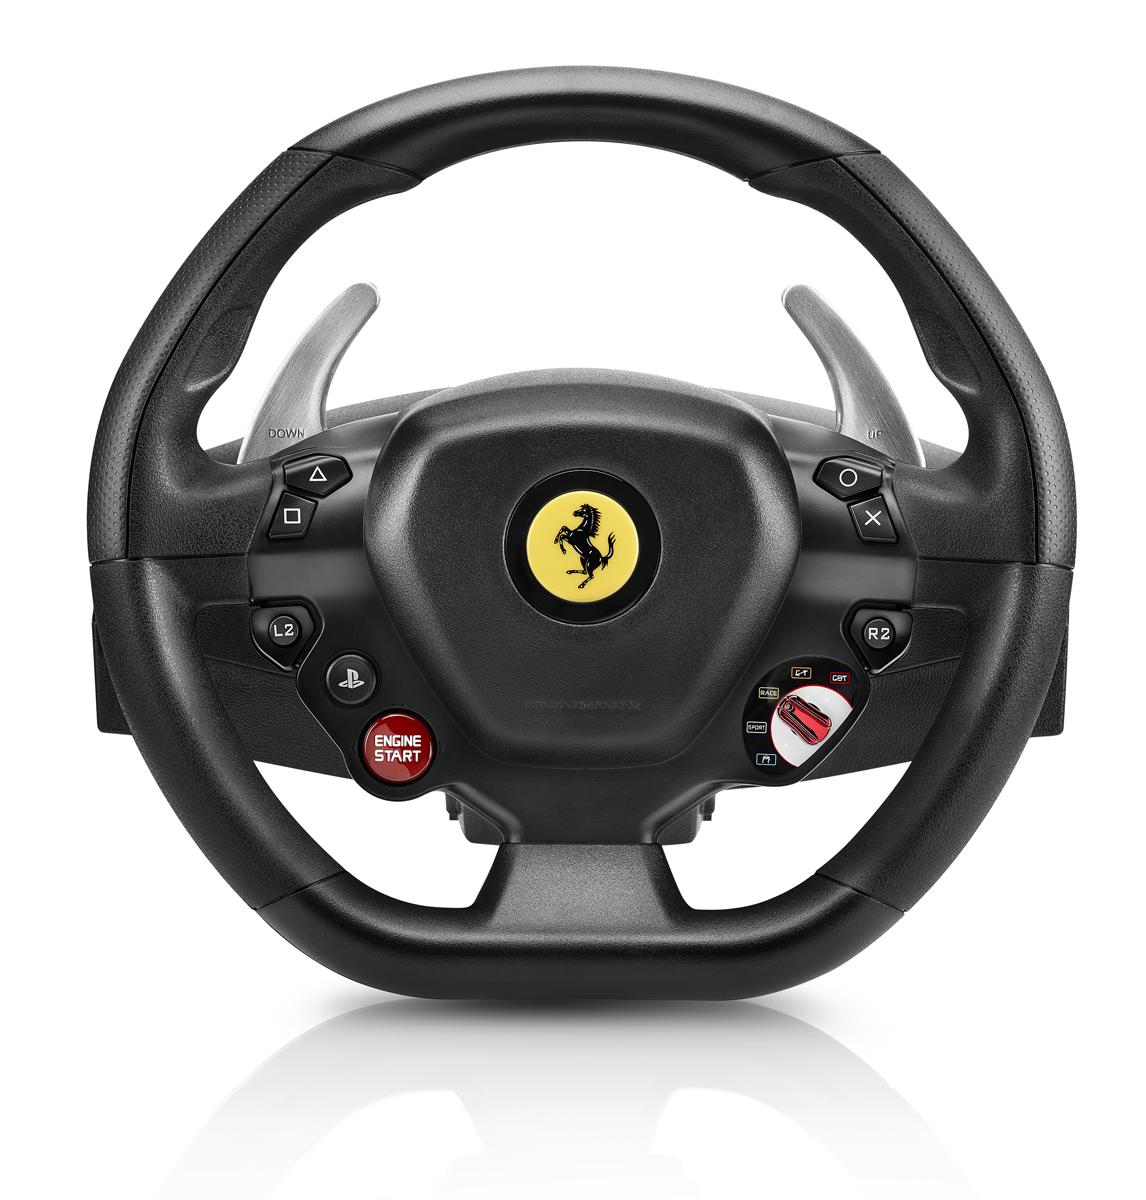 Zakazat.ru Thrustmaster T80 Ferrari 488 GTB Edition руль для PS4/PC